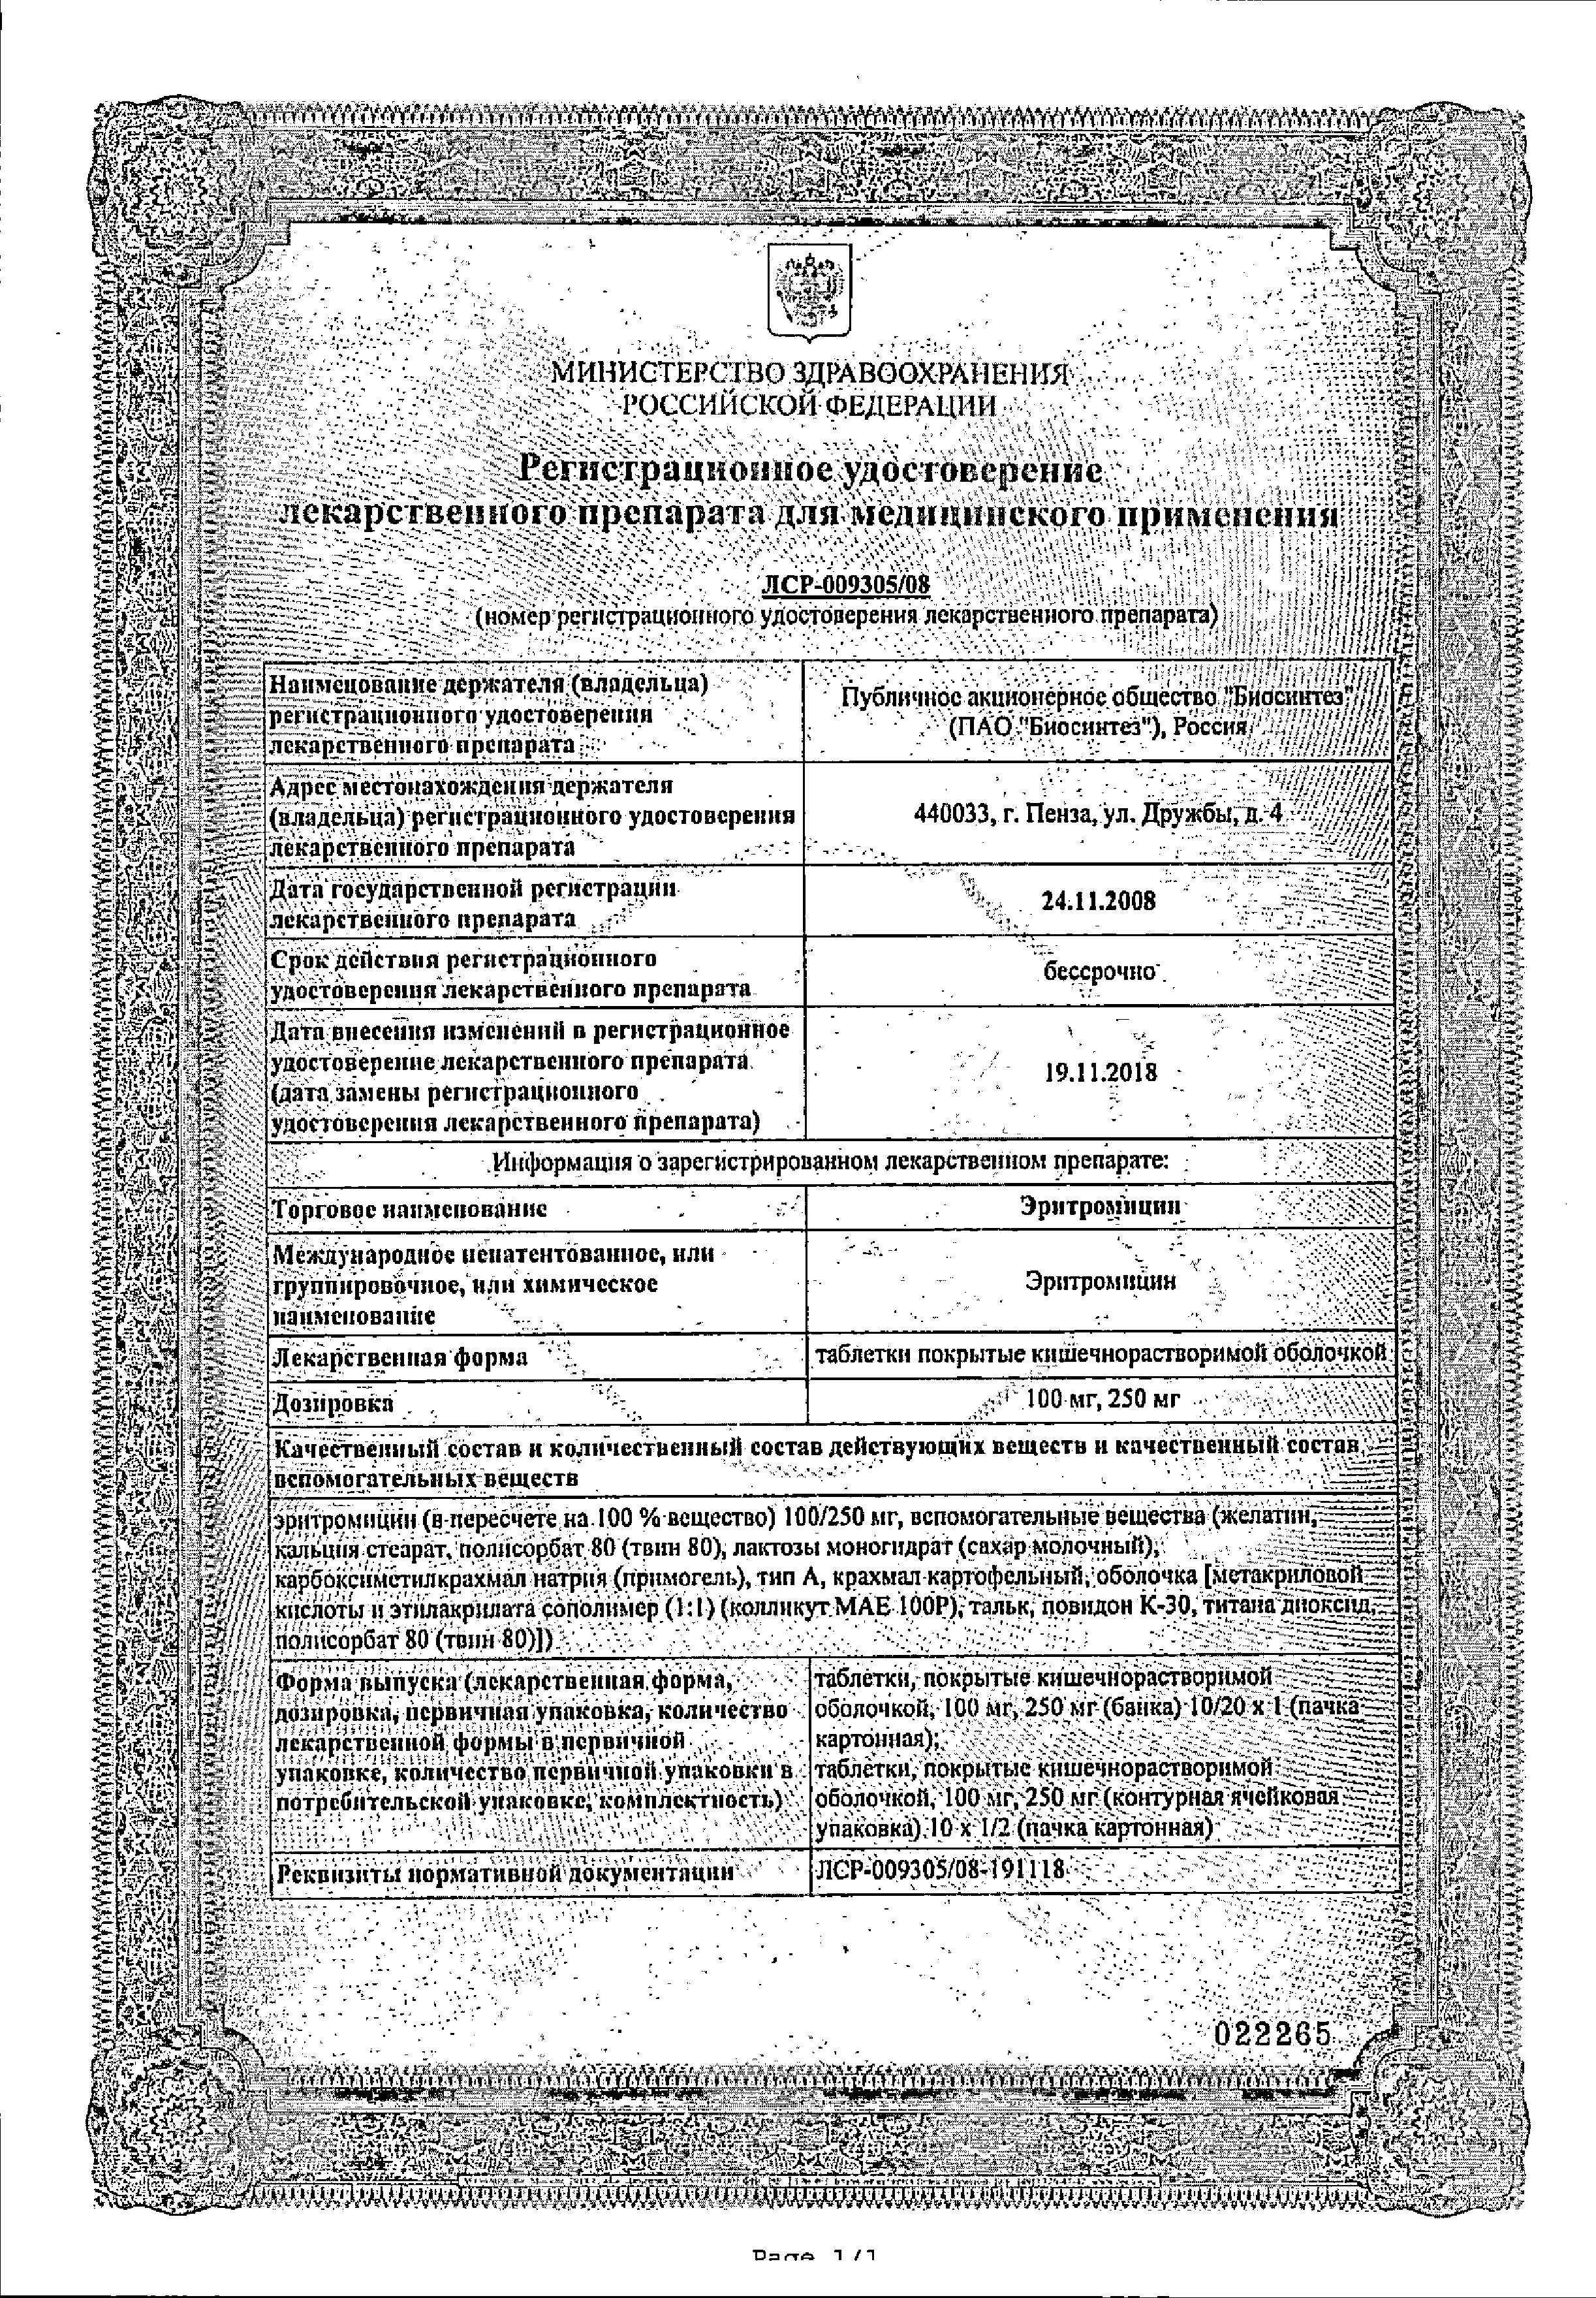 Эритромицин сертификат